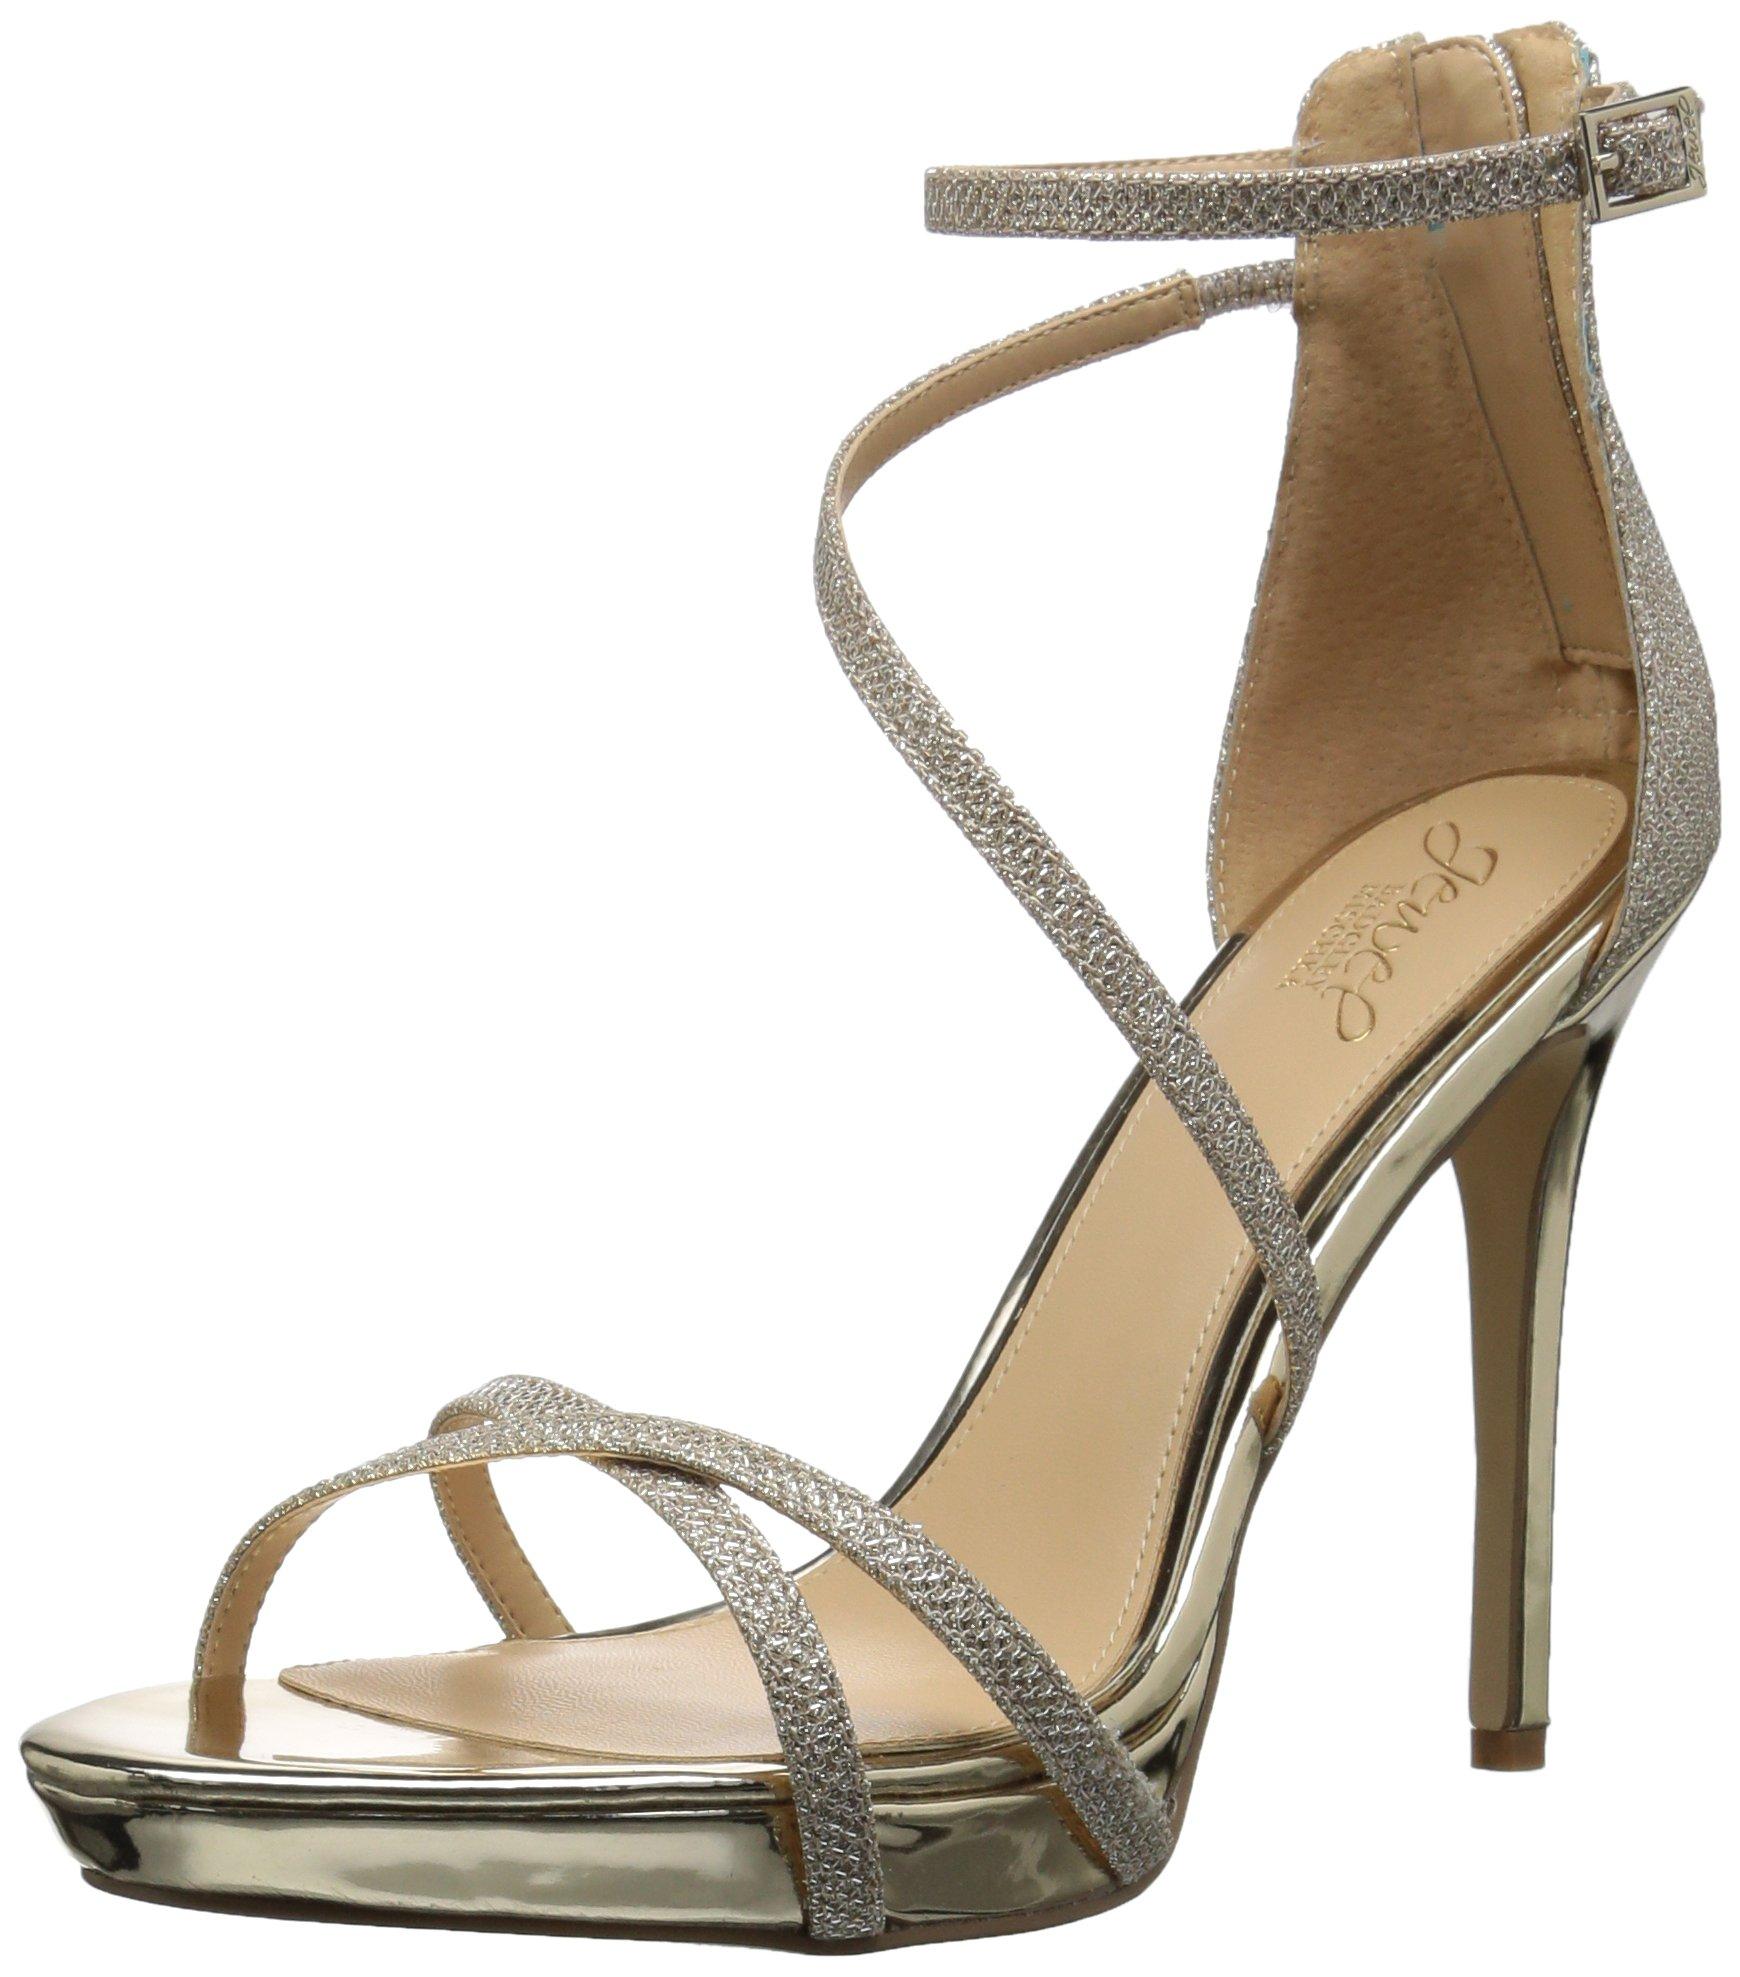 Badgley Mischka Jewel Women's Galen Heeled Sandal, Gold, 7 Medium US